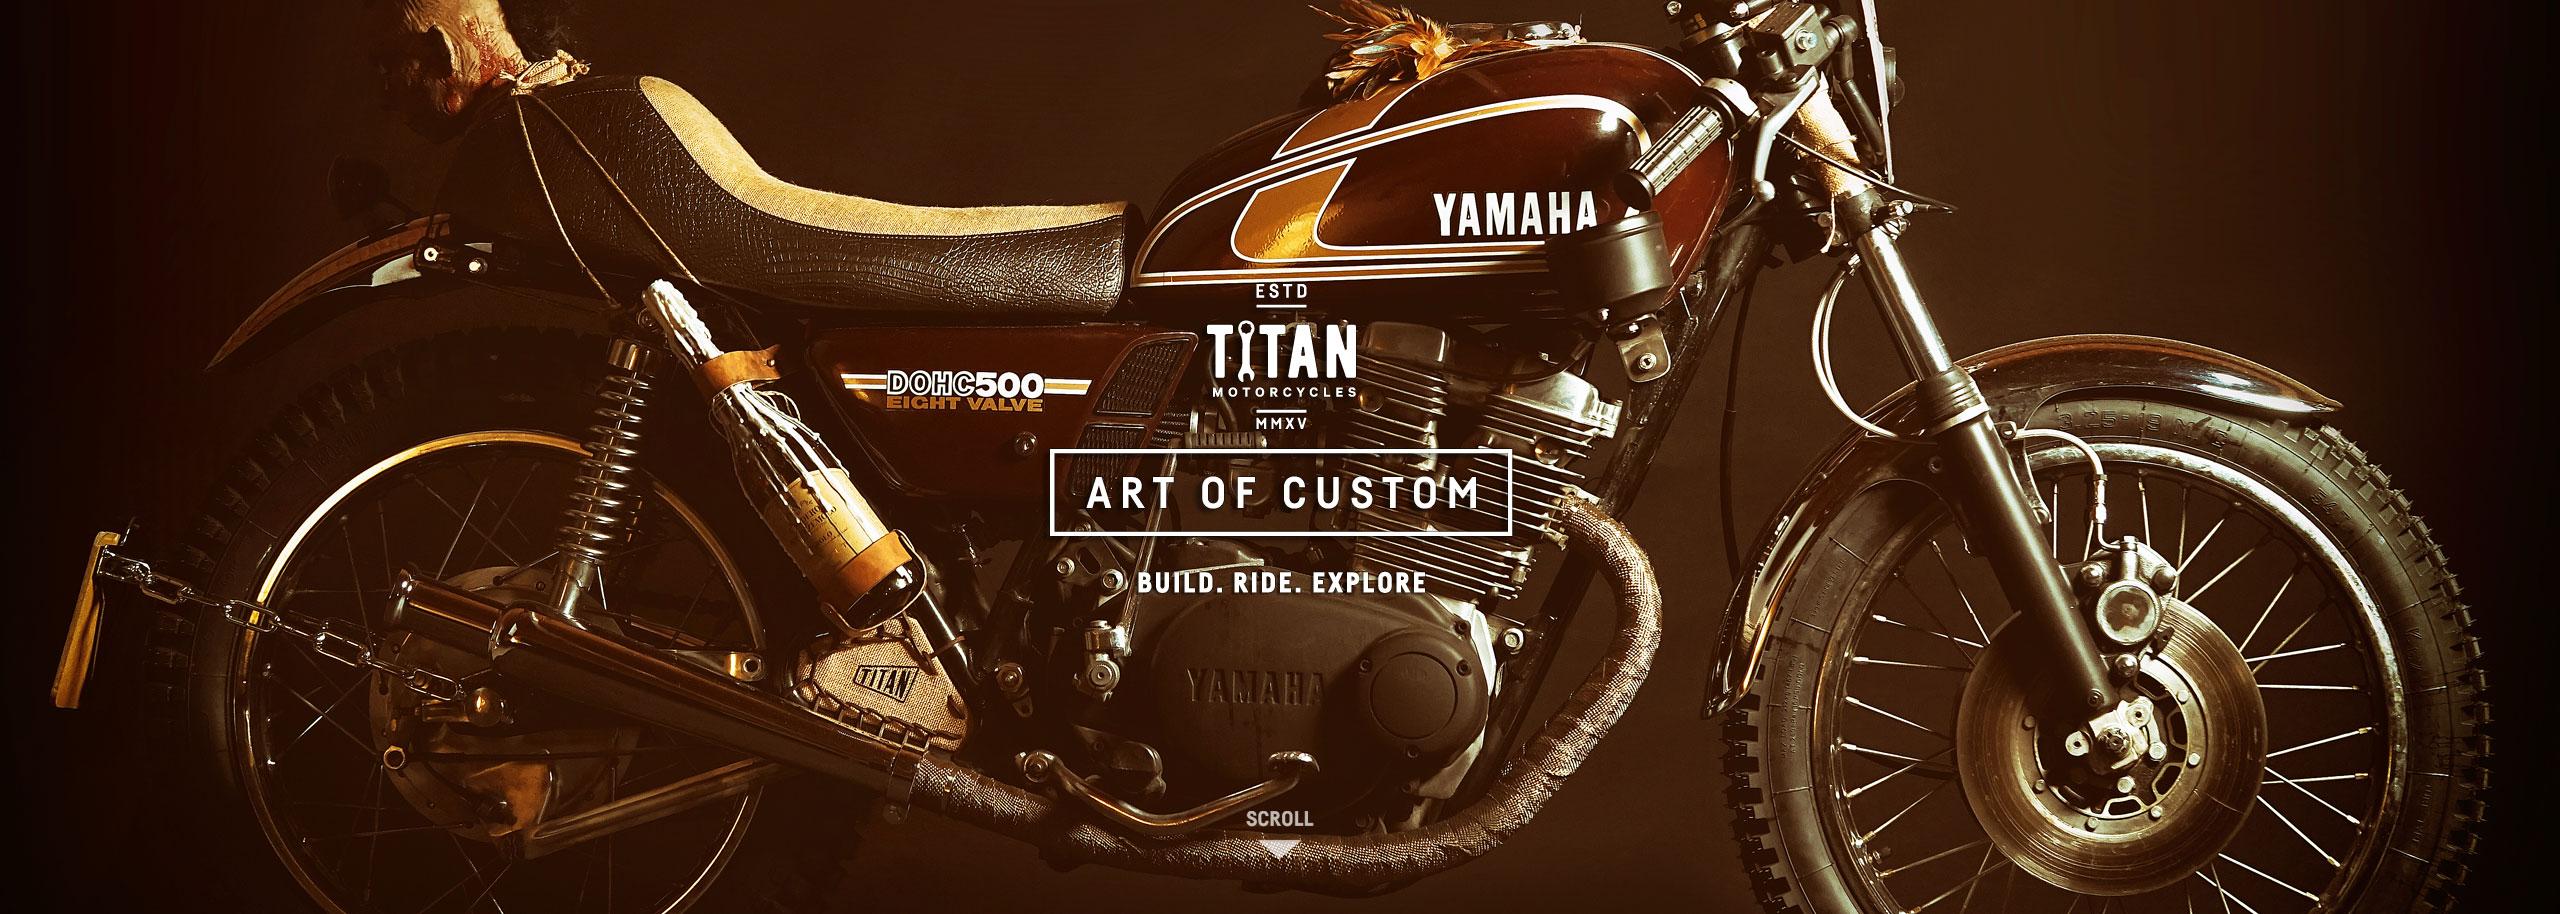 01_TITAN-VOODOO_Yamaha-XS-500_Cafe-Racer-Graz-Motorrad-Umbau-Steiermark-Oesterreich-Vintage_Custom-Bikes_Zweirad_Custom-Wien-Graz